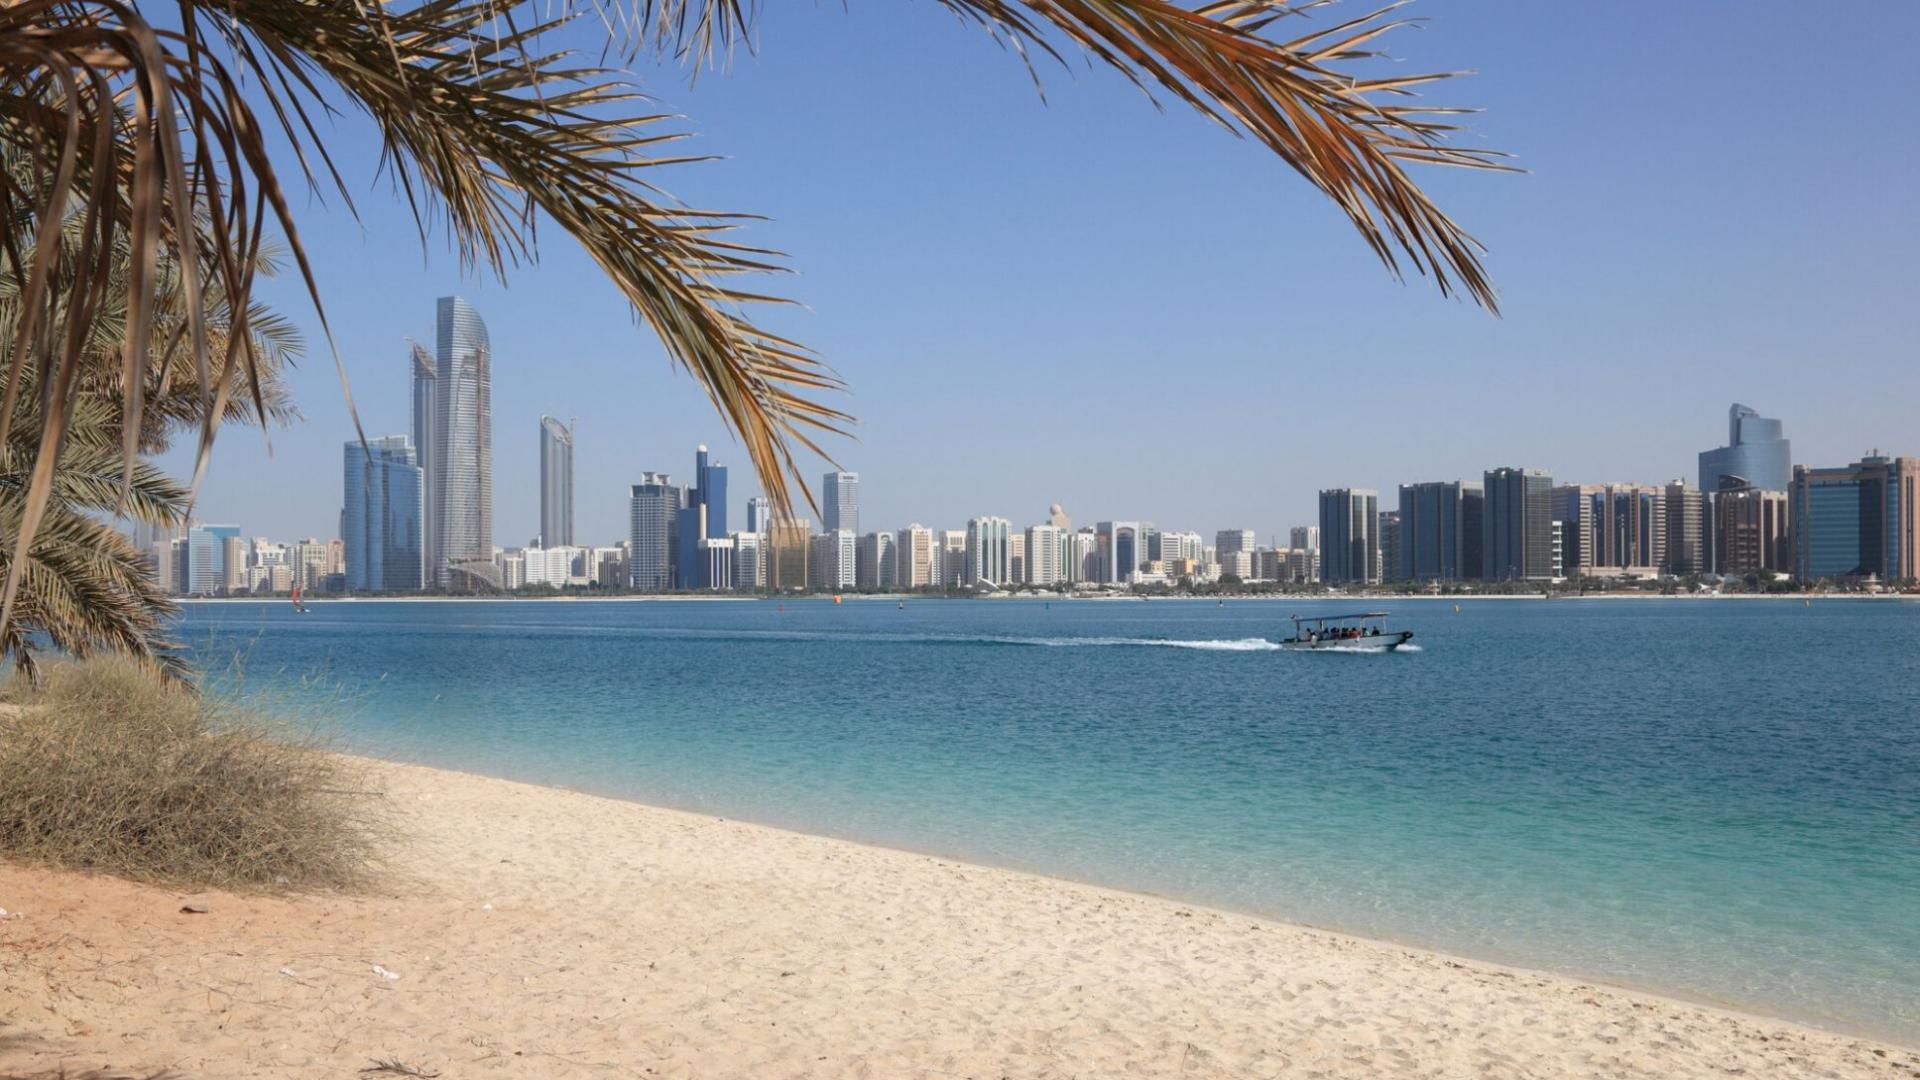 Žavus Corniche paplūdimys Abu Dabyje